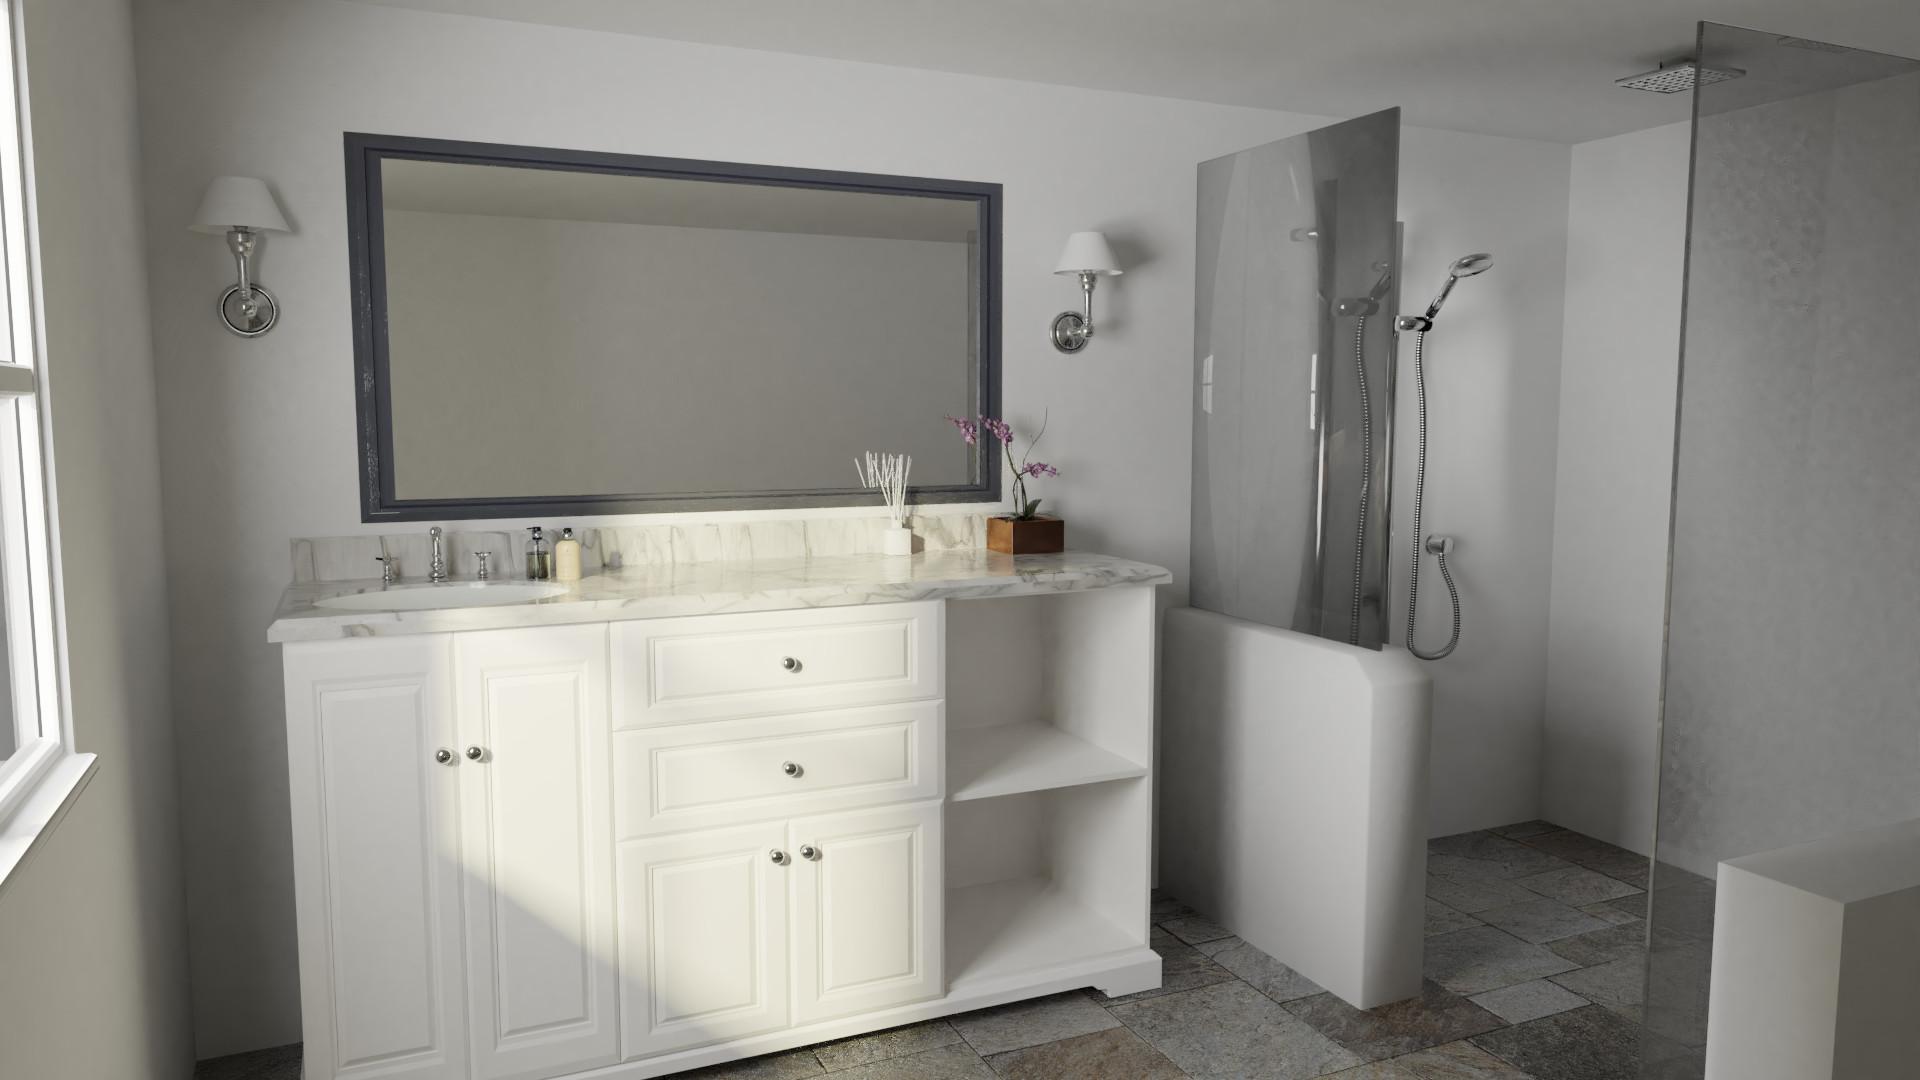 Henry lynch bathroom 2 8